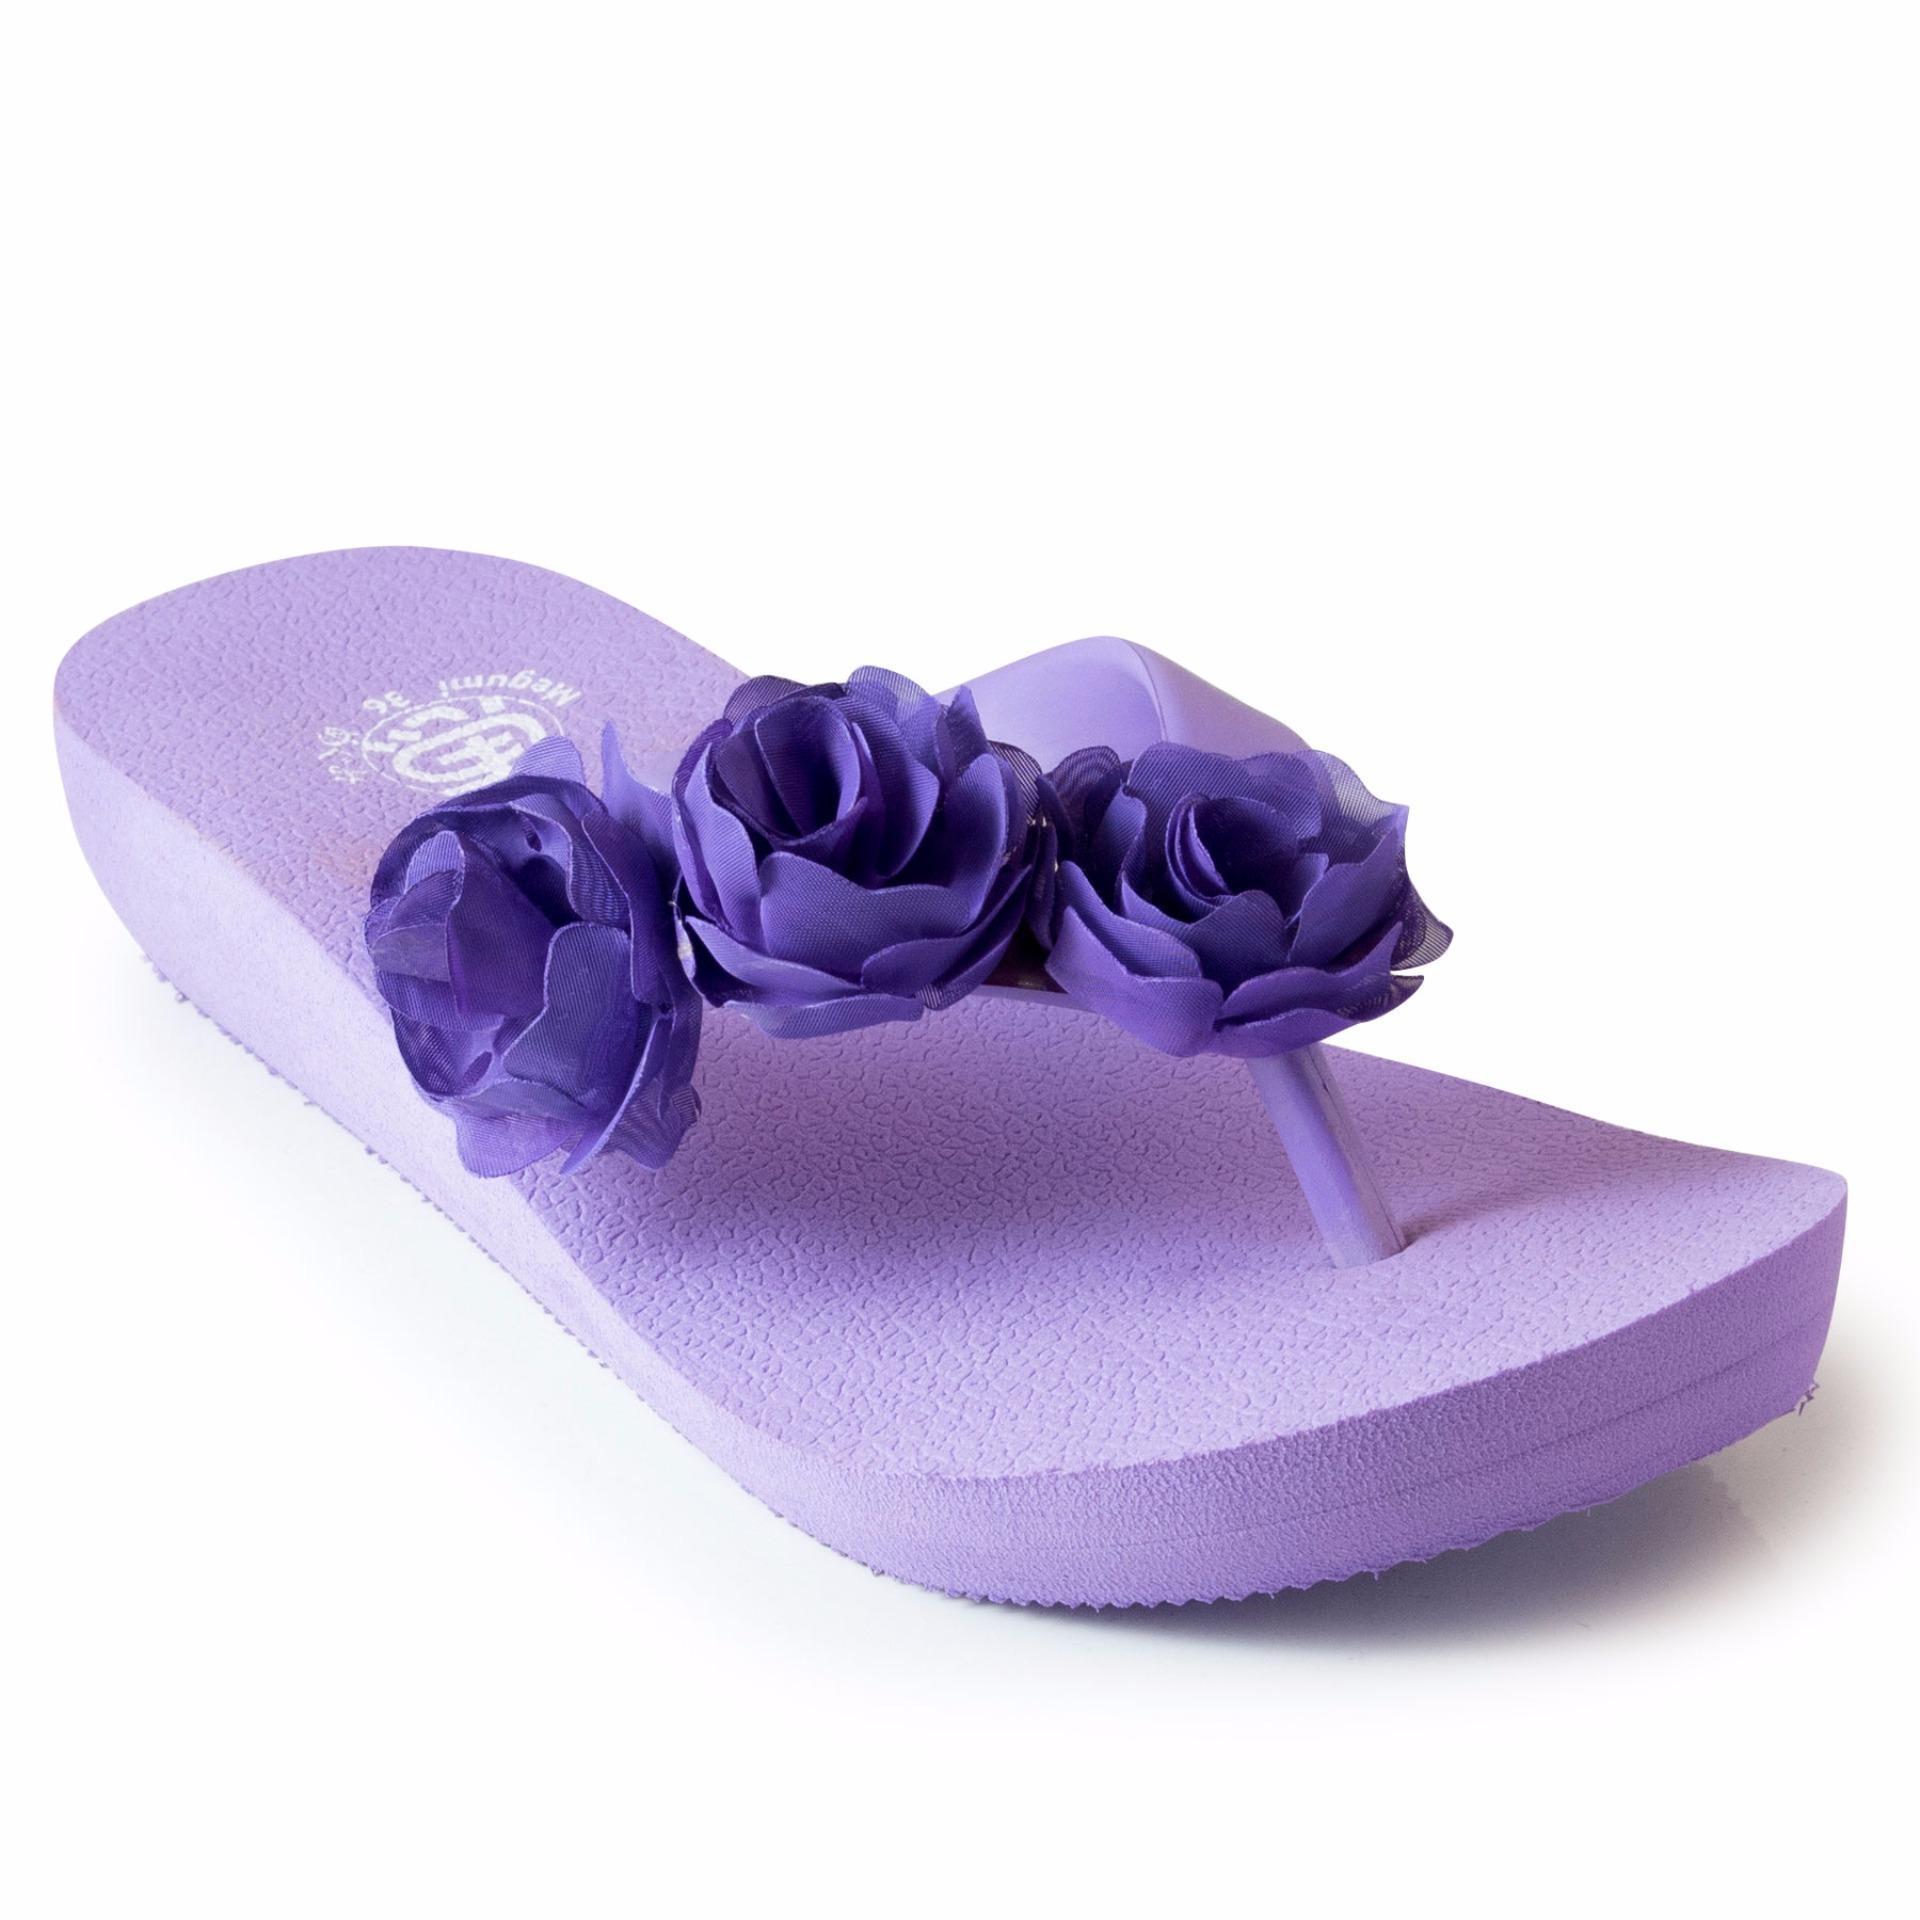 Harga Megumi Sandal Jepit Wanita Aster Purple Asli Megumi Sandal